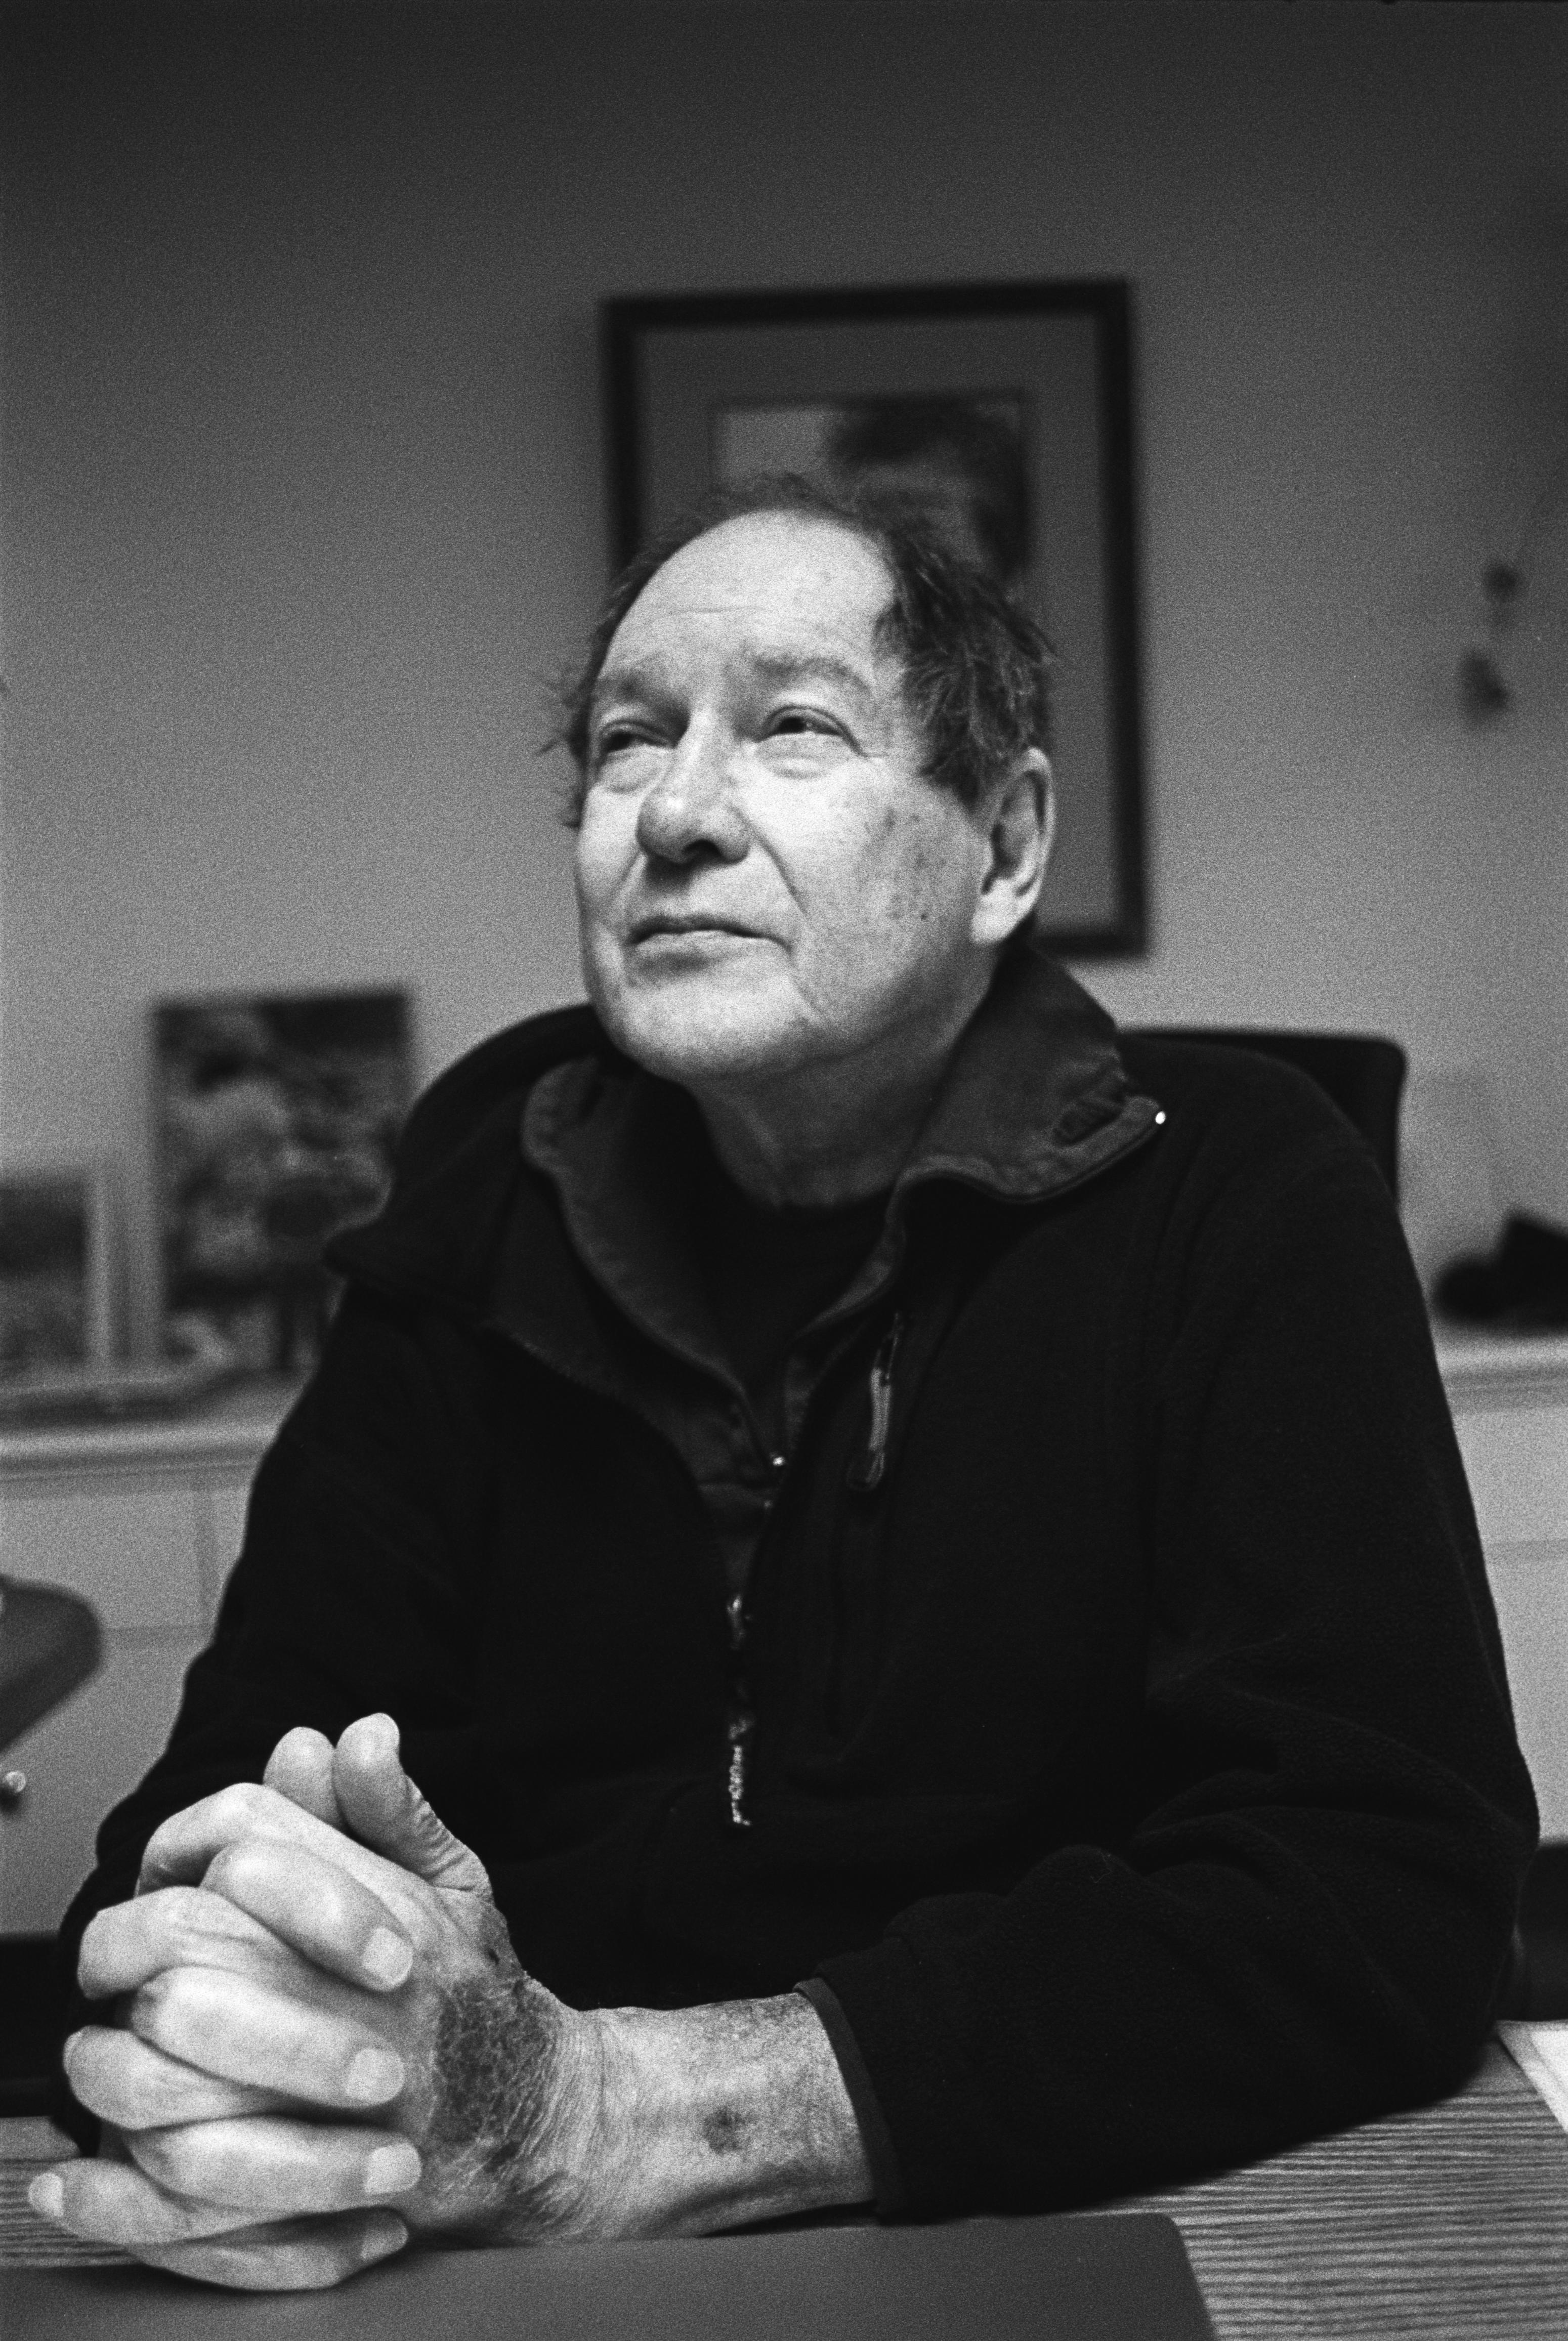 Bill Solomon